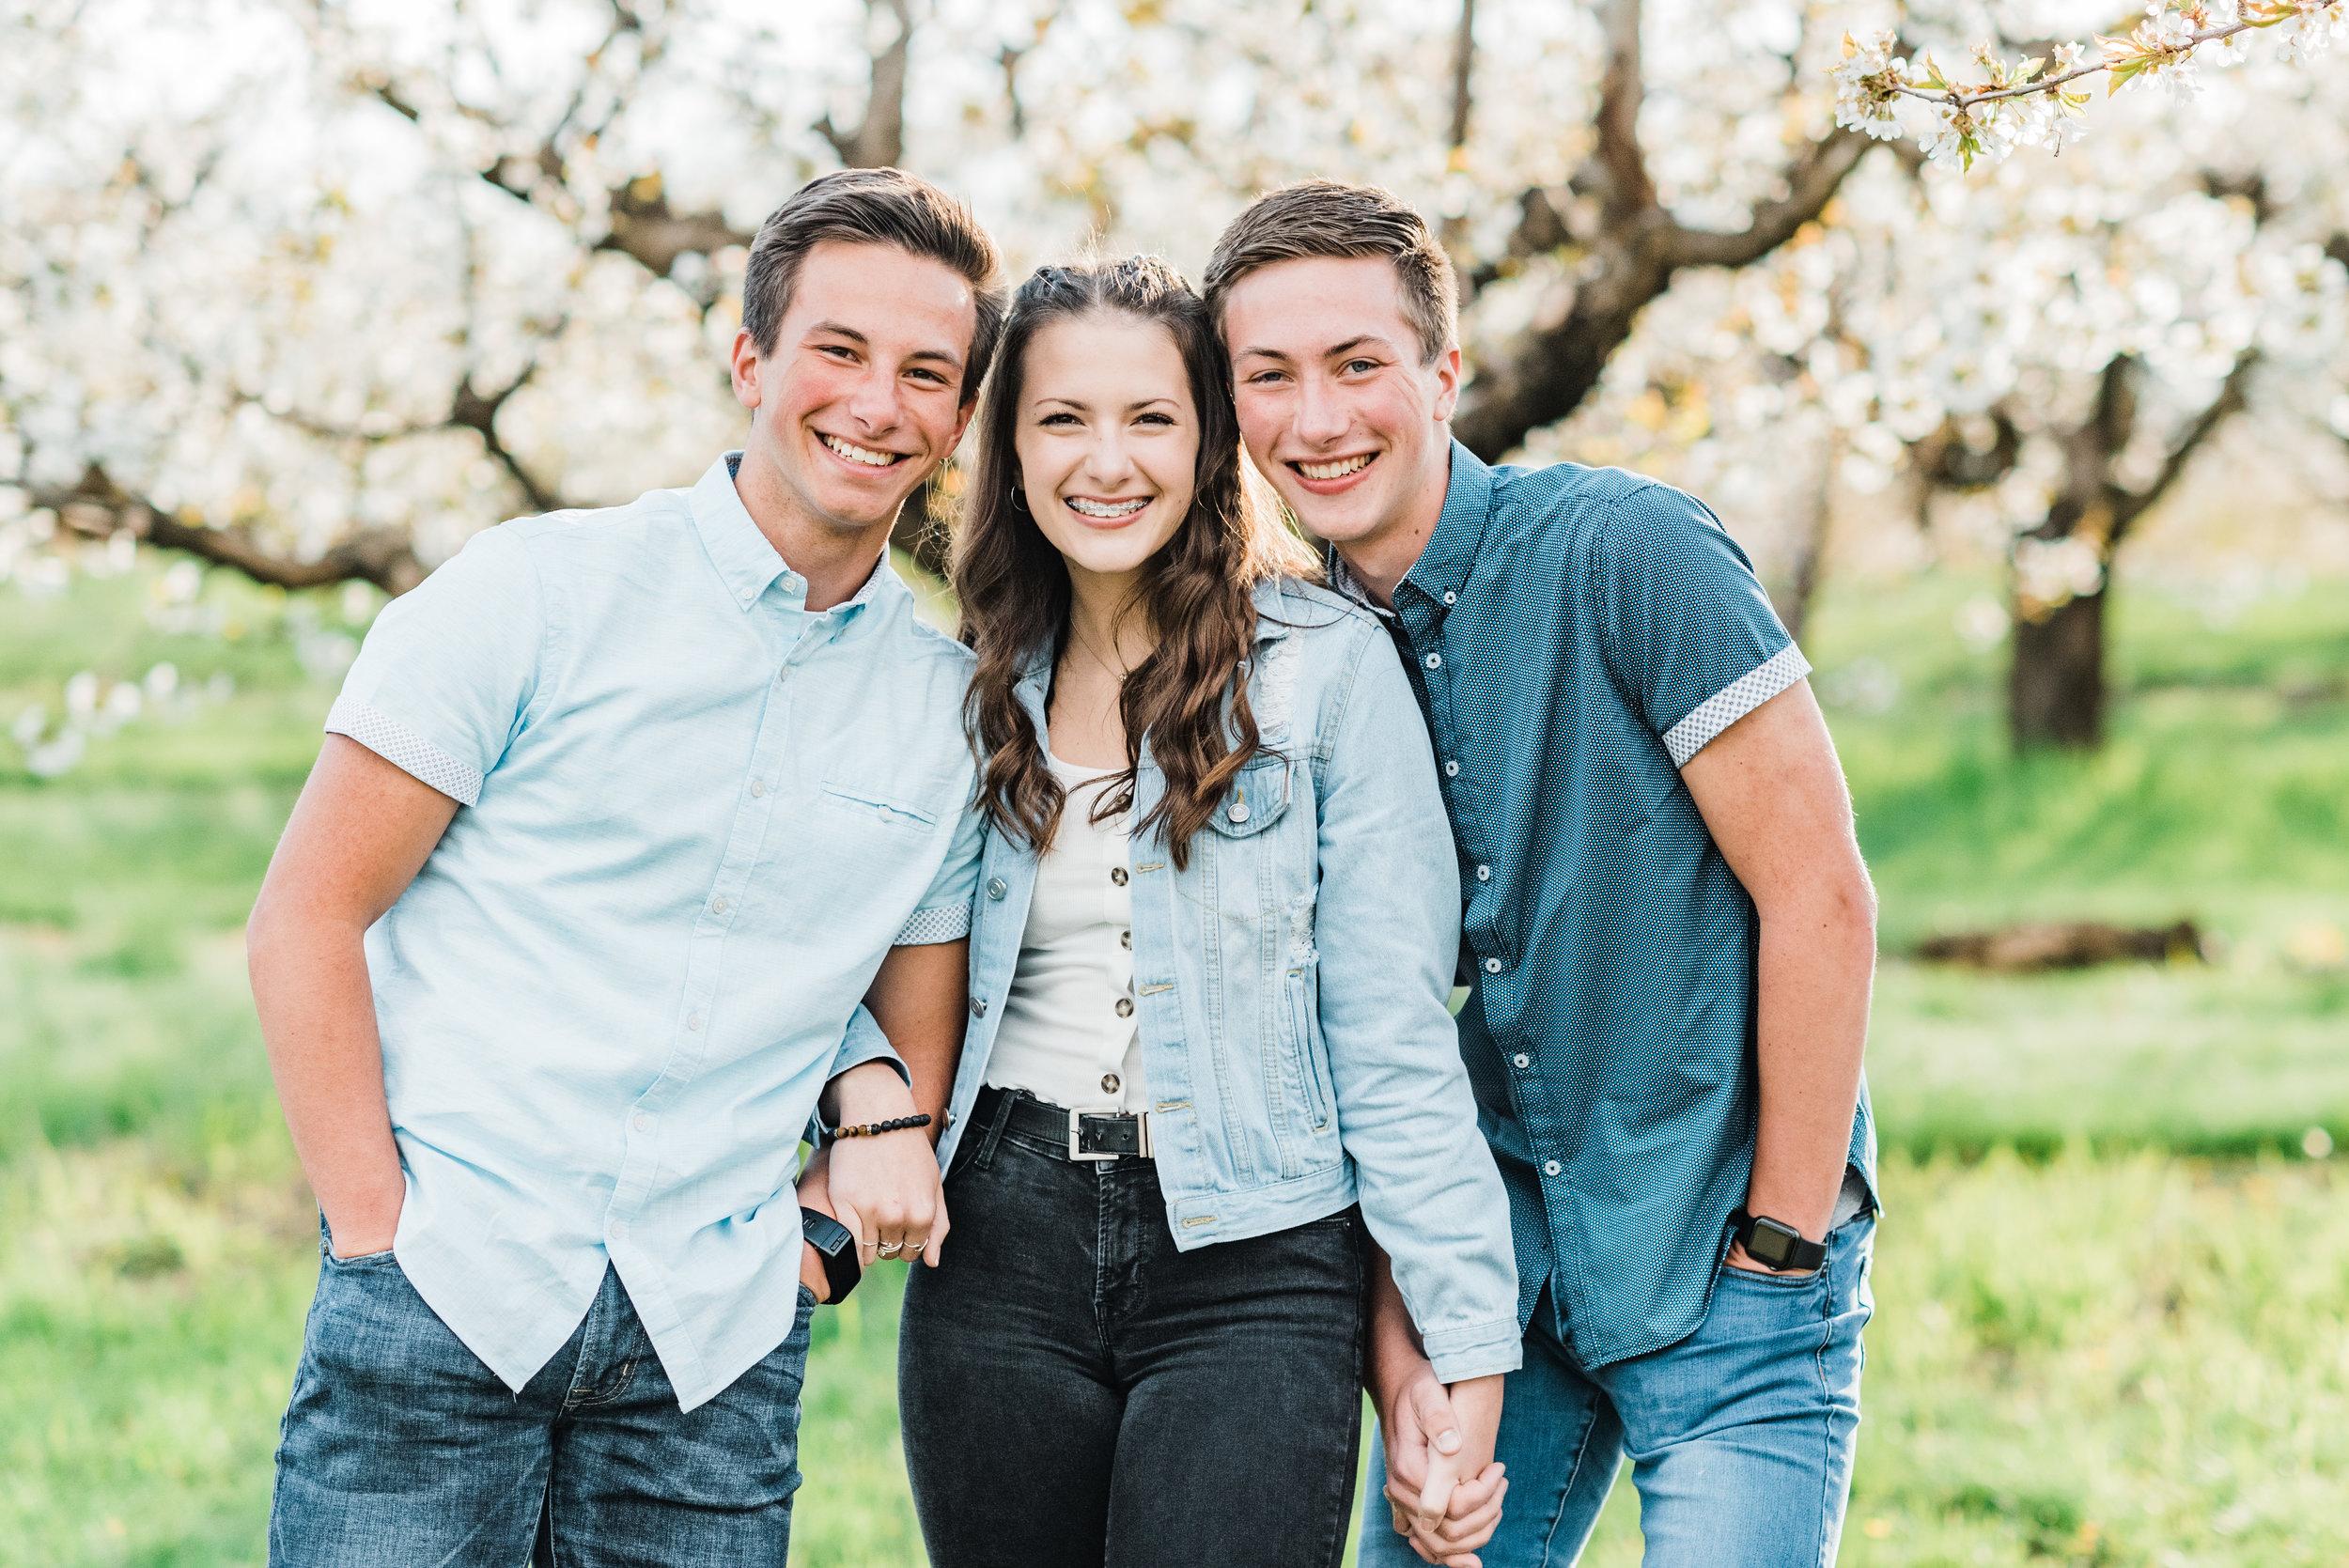 orchard_family_session_spokane_wa-6.jpg